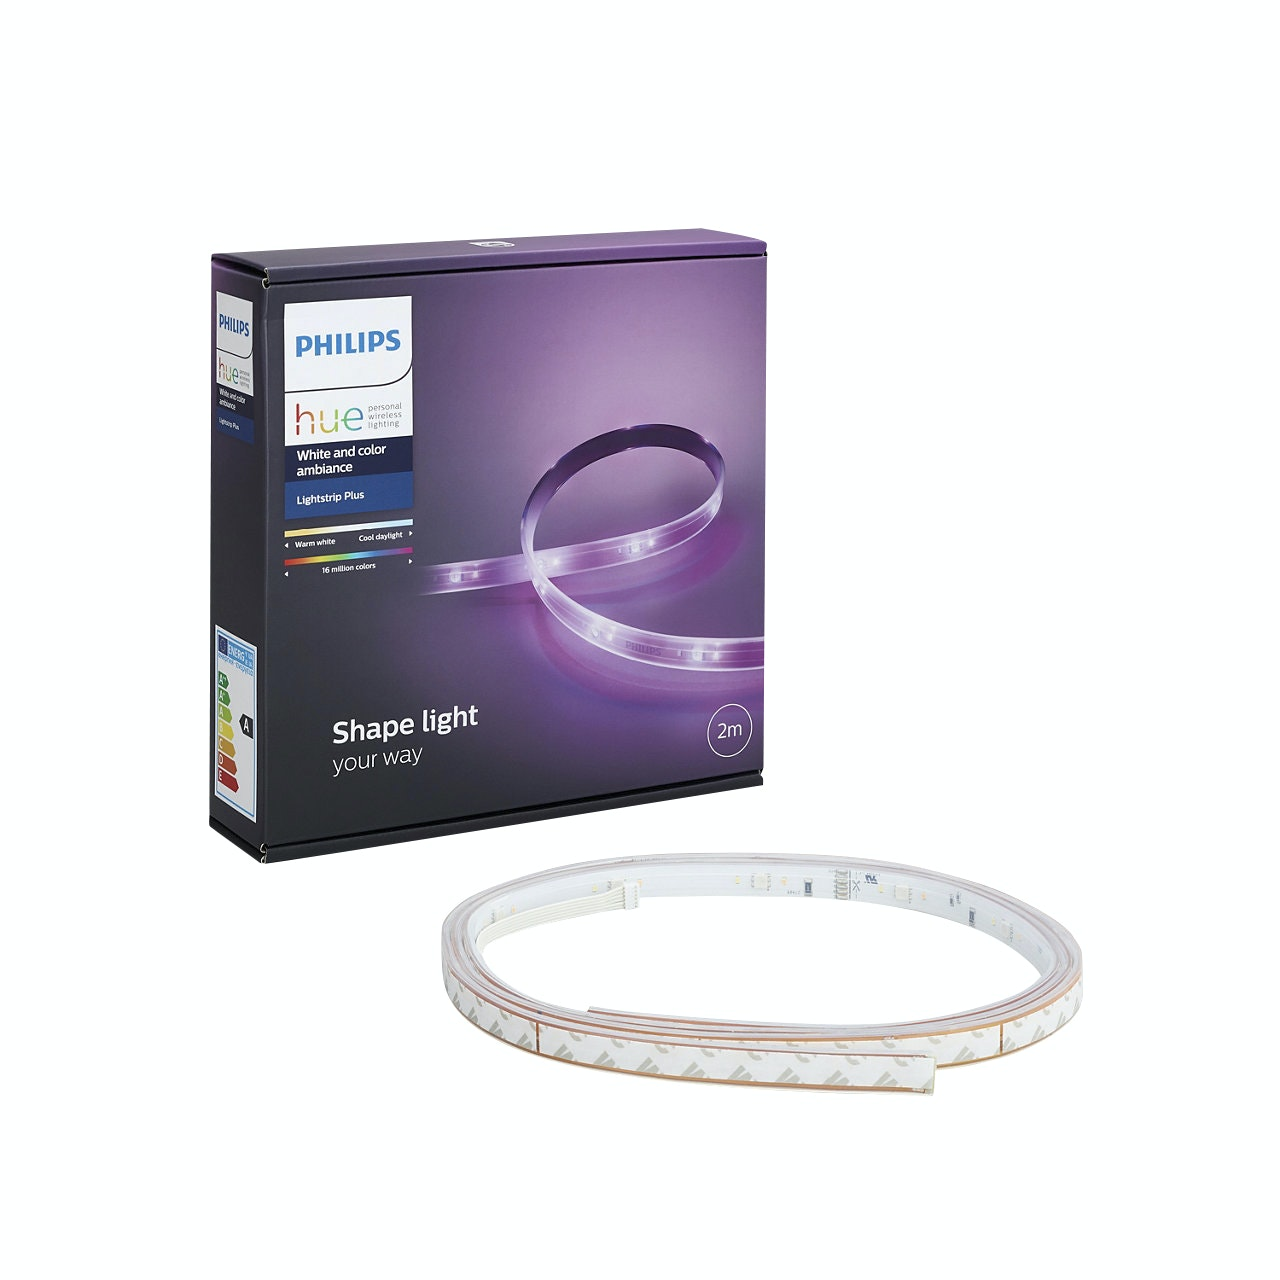 Led-Strip Philips Hue Plus Basenhet Ambiance 9.5W E27 Vit 2m